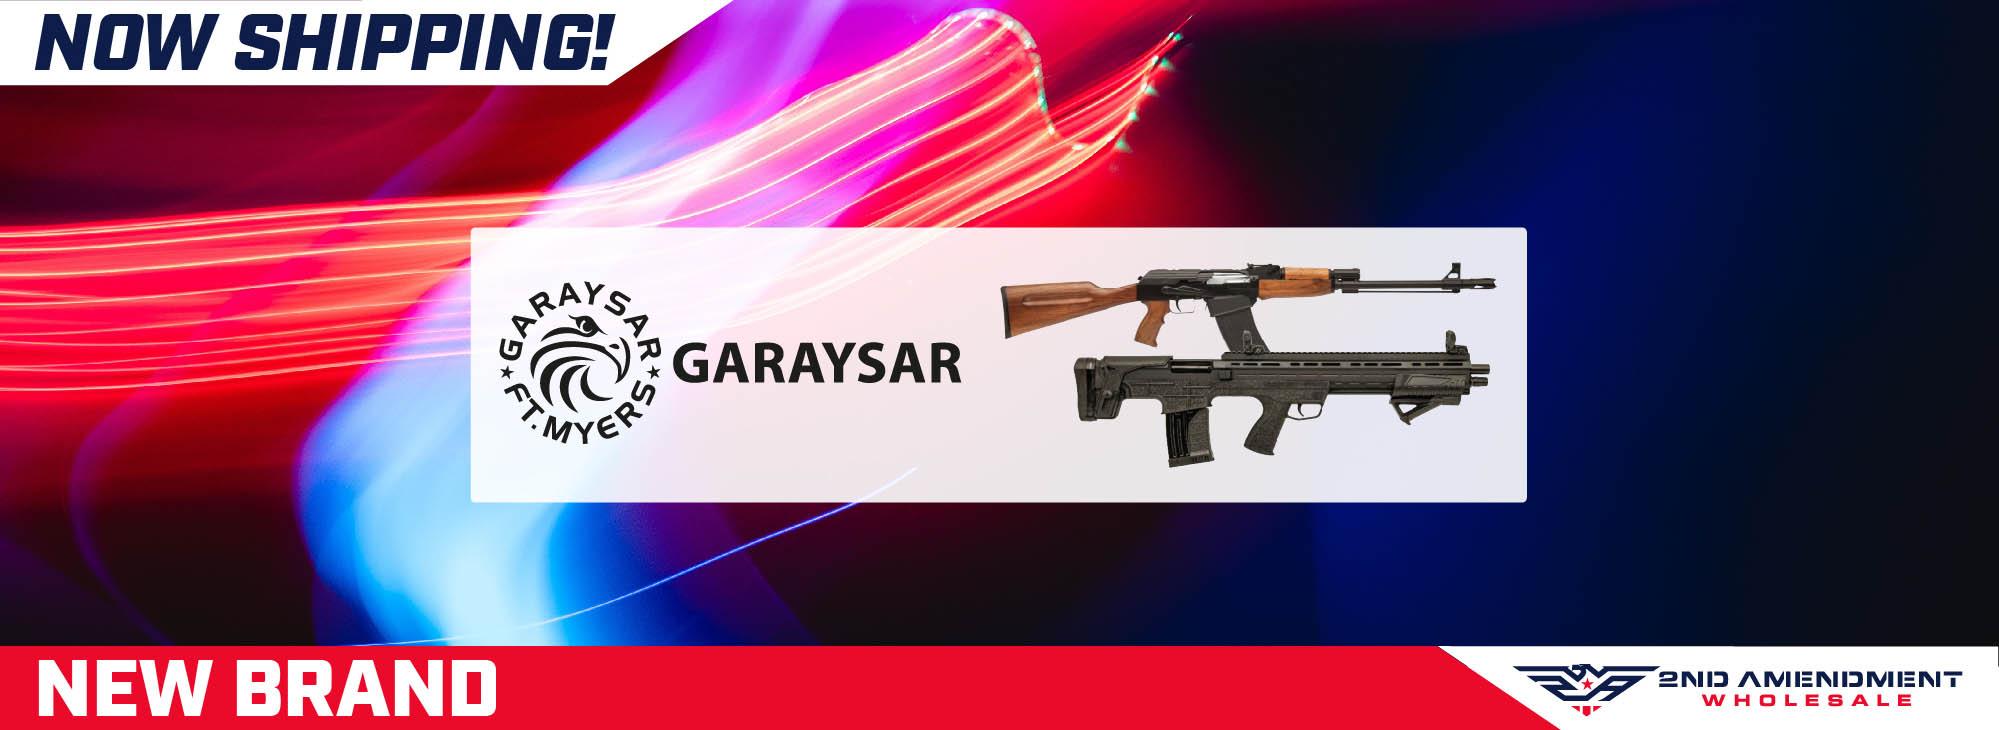 New Brand Garaysar